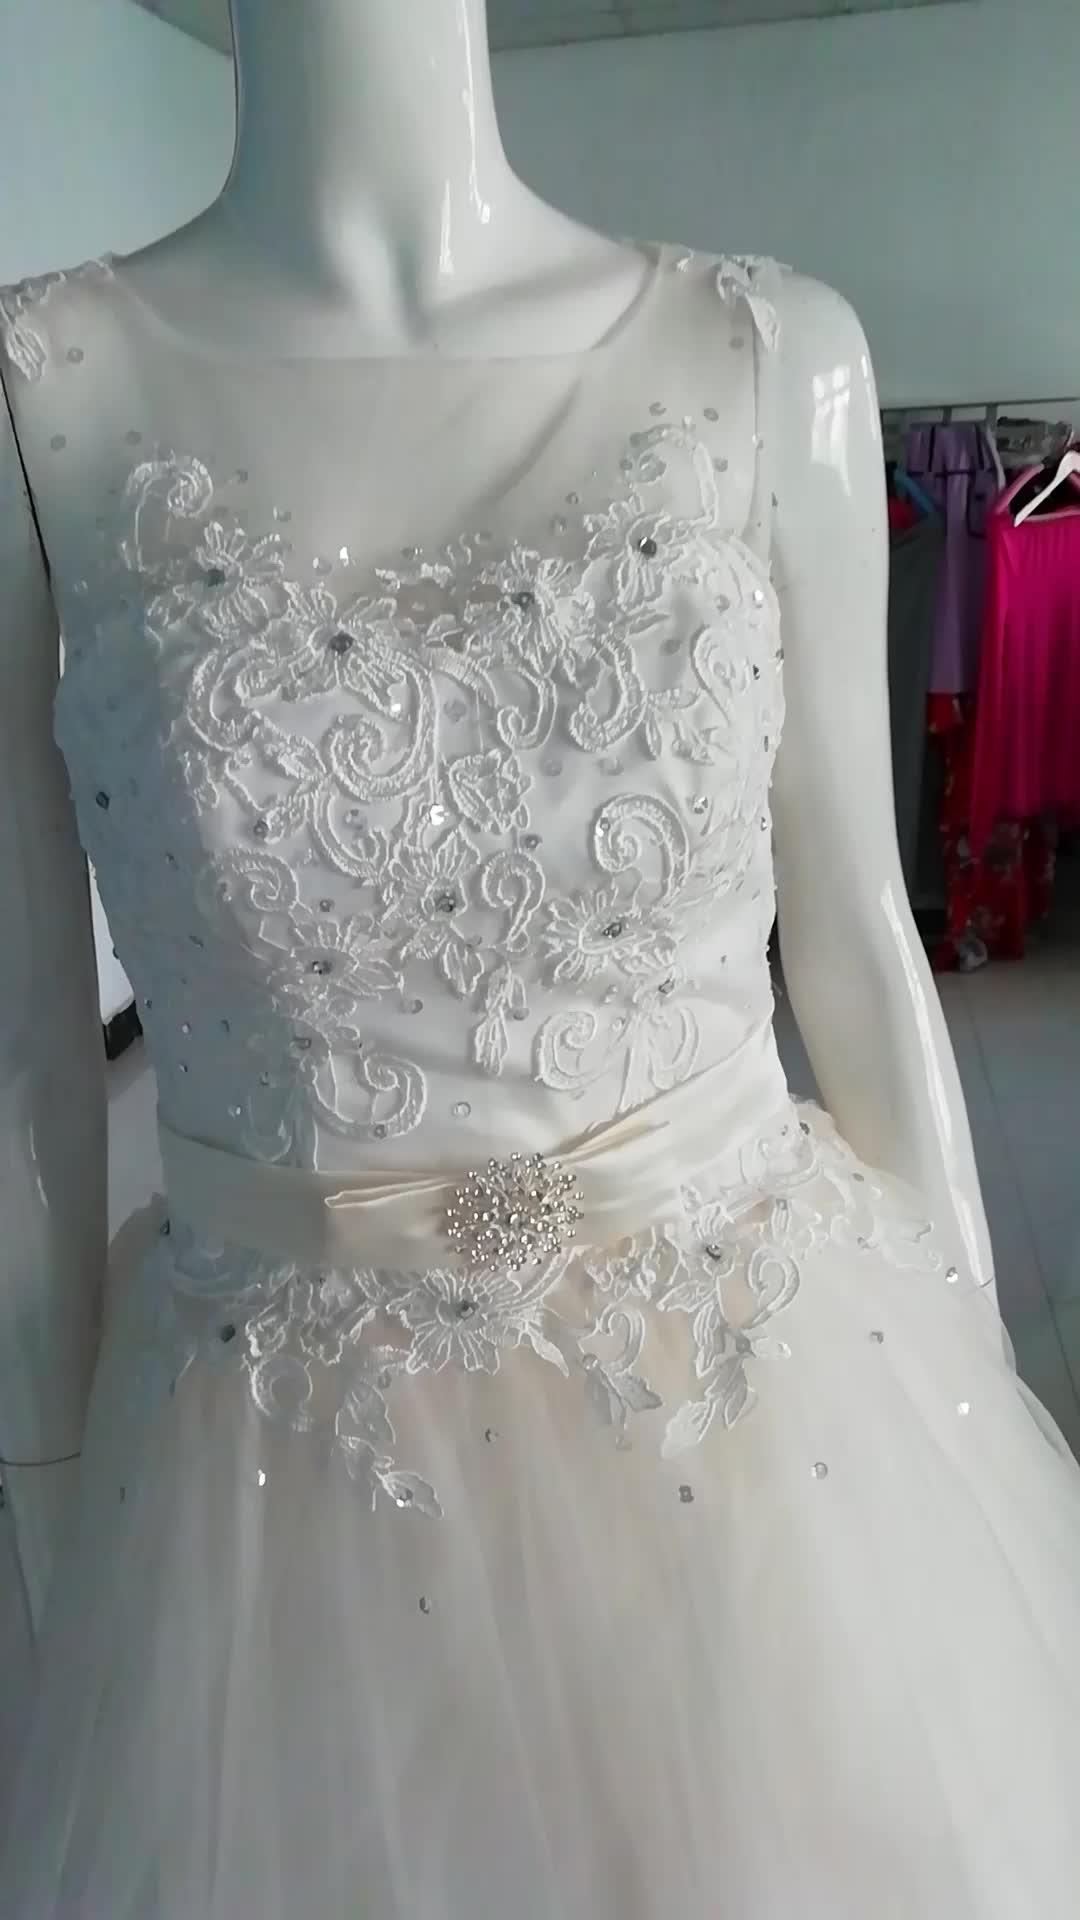 Ywhola Vintage Sleeveless Bow Long Tail Bridal Gowns Customized Size Wedding Dresses